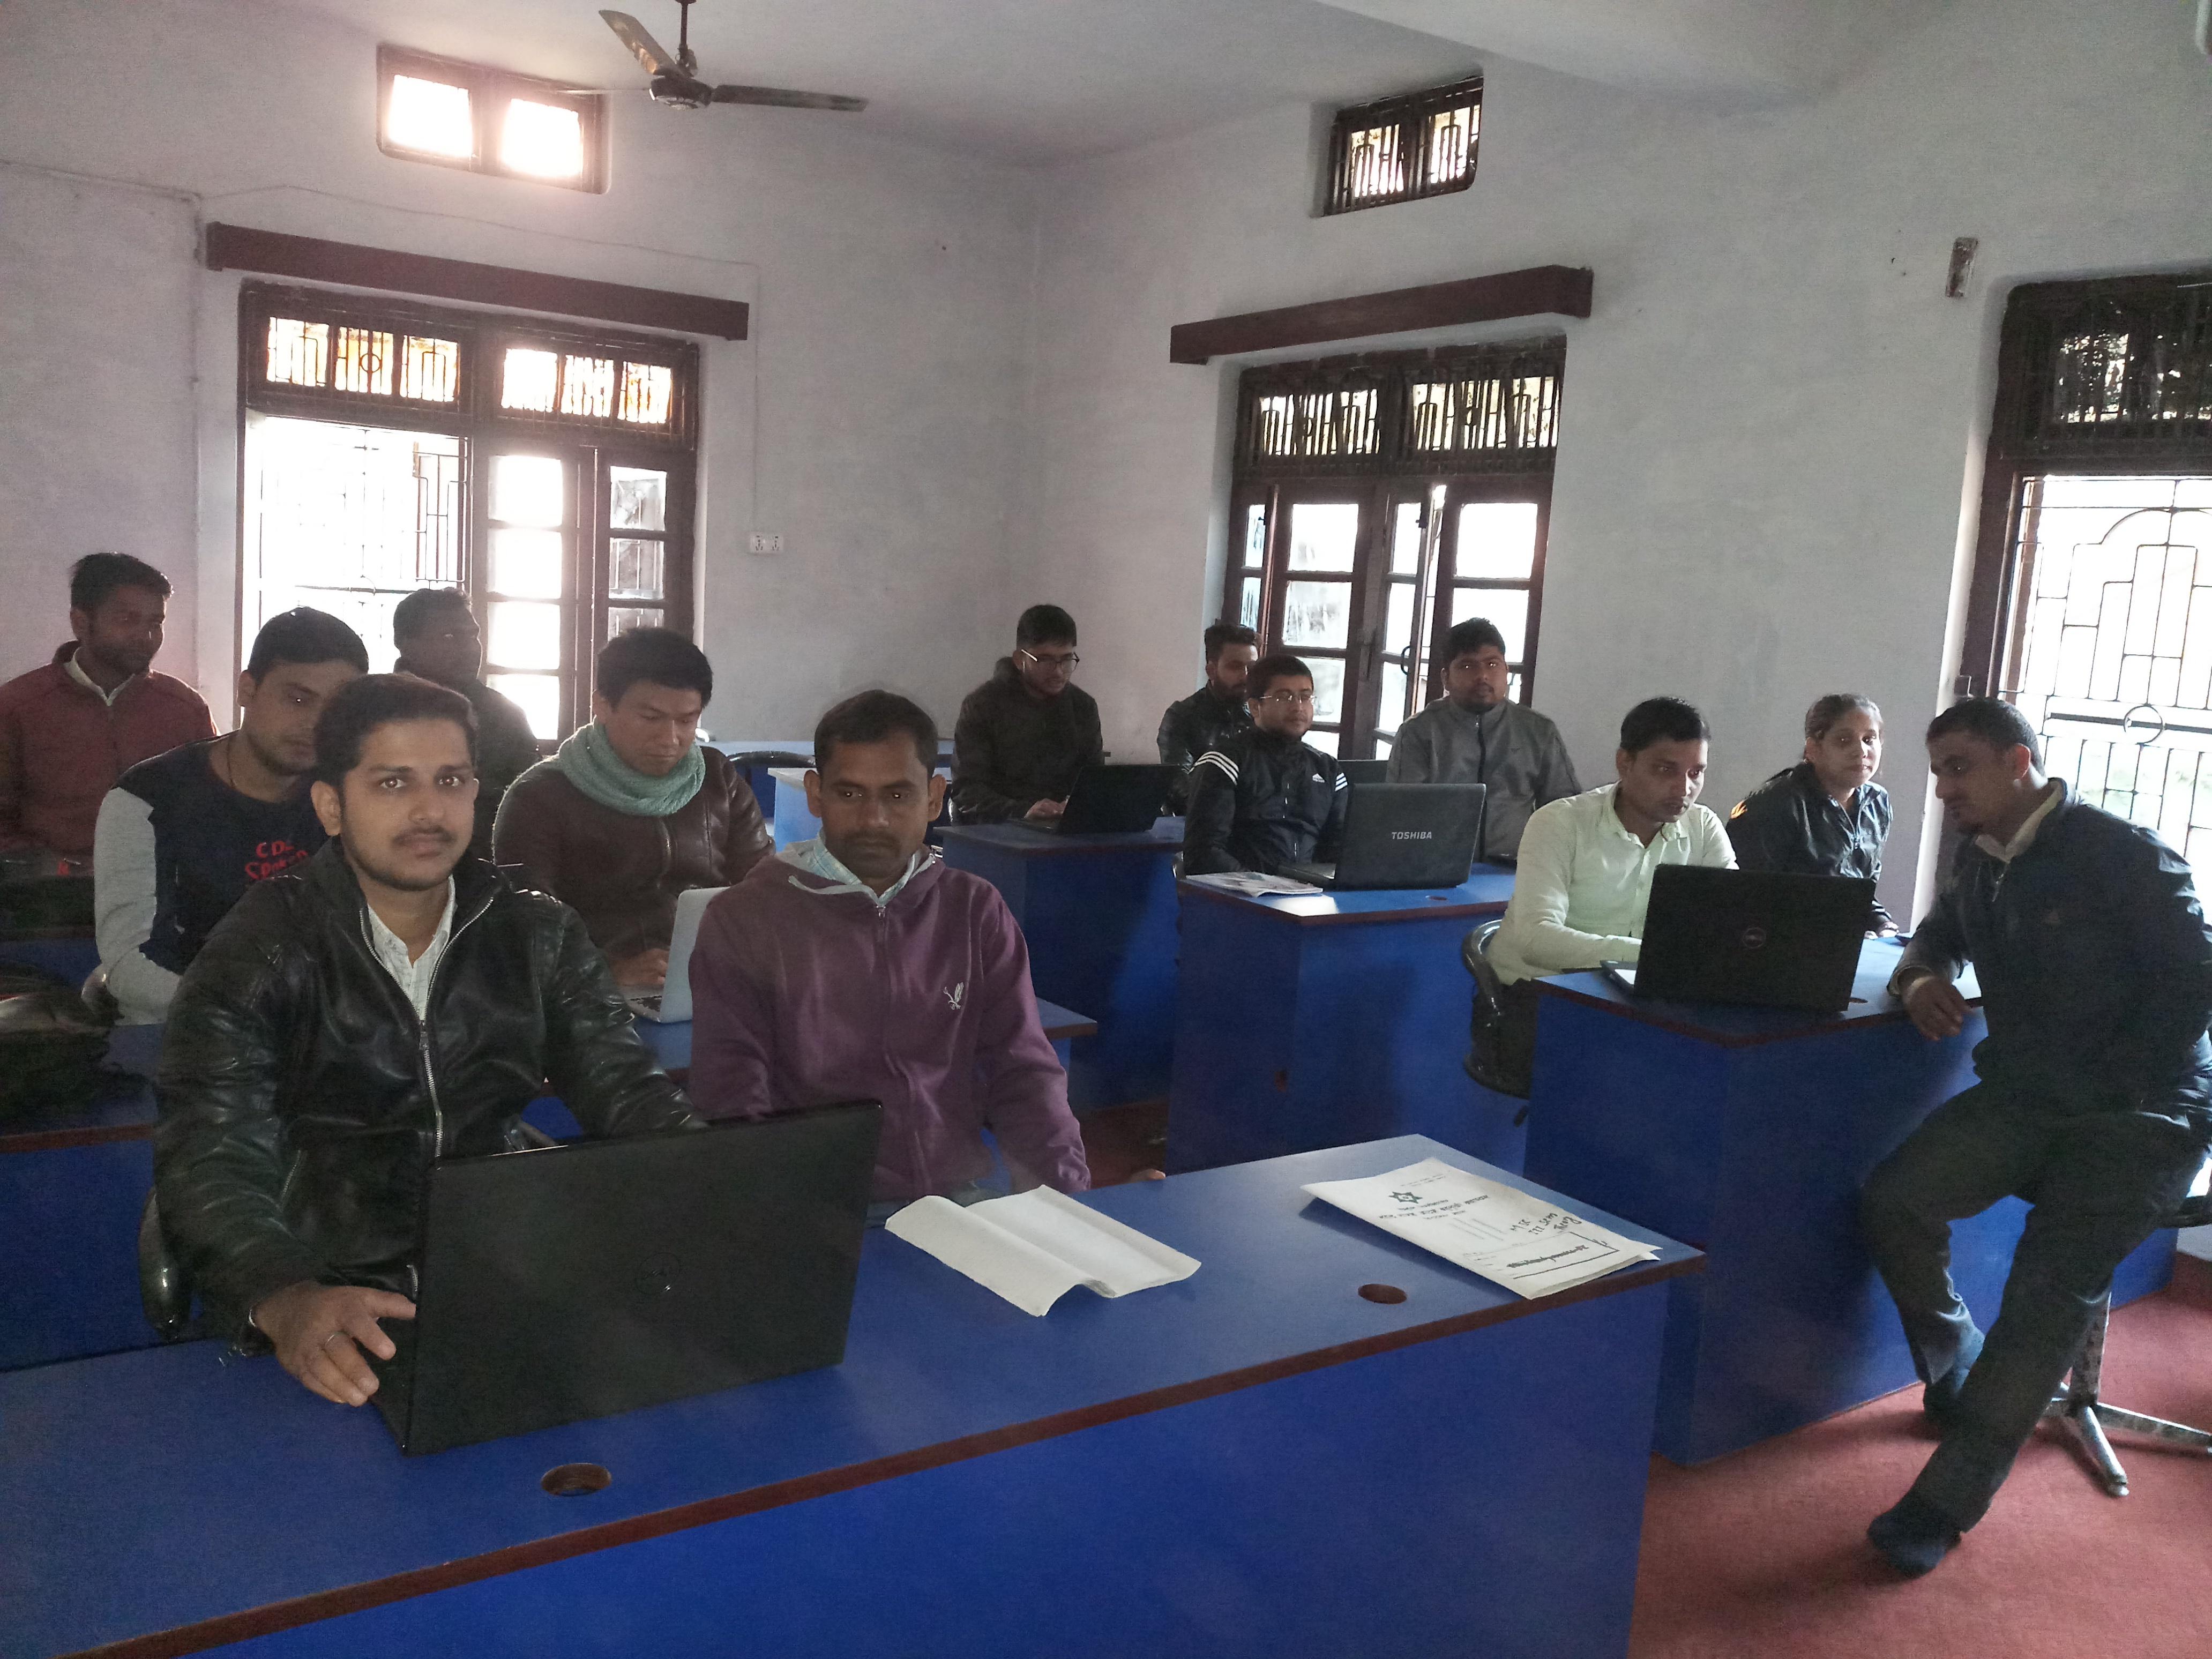 mahendra morang campus Physics (M.Sc. and B.Sc.)